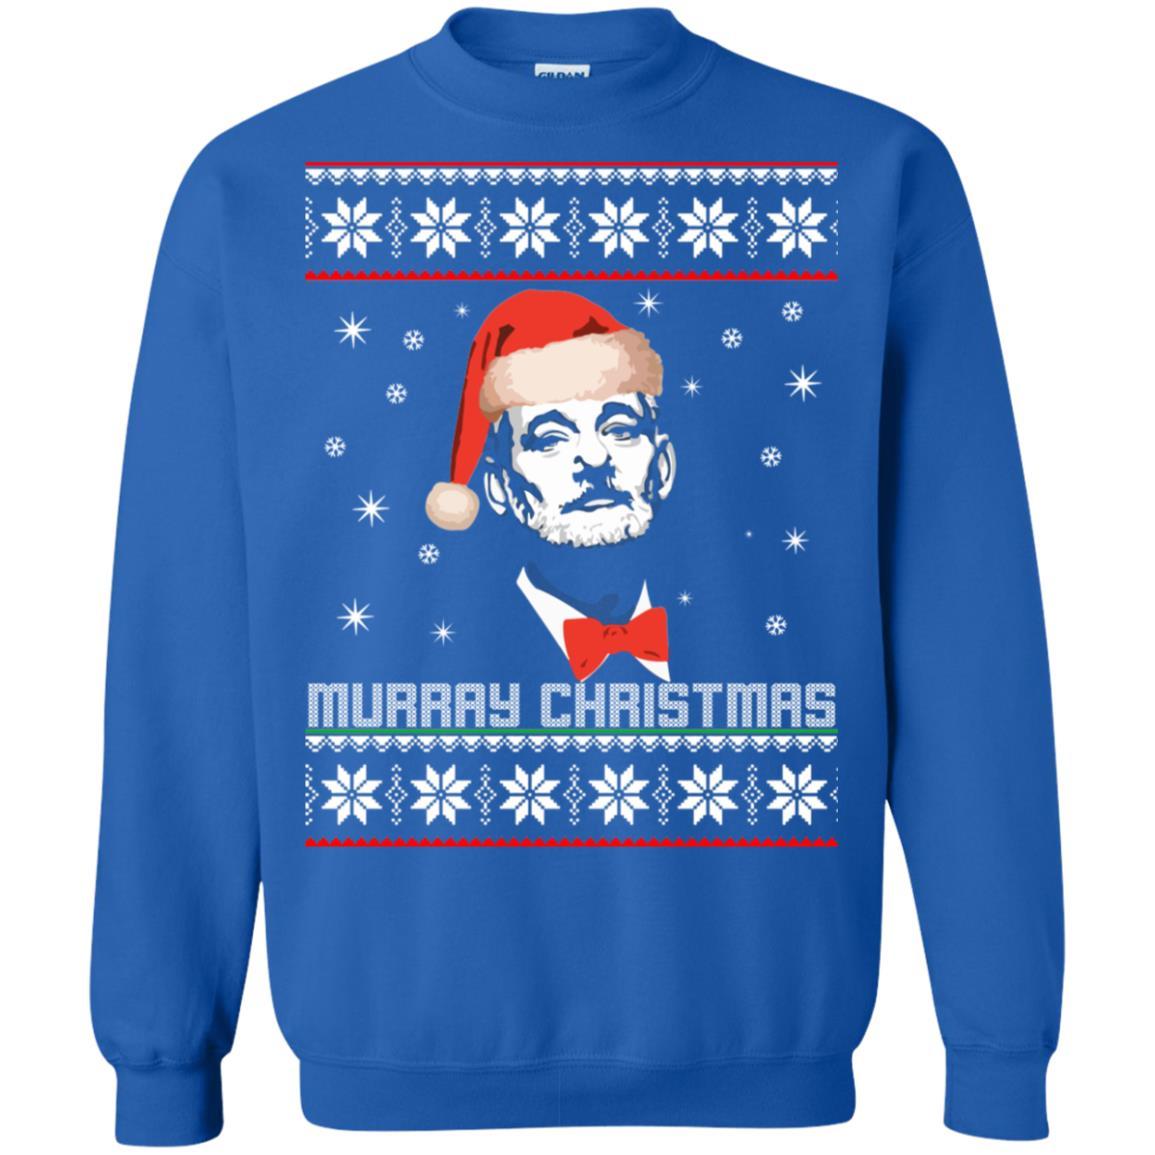 Murray Christmas ugly sweater, hoodie, long sleeve